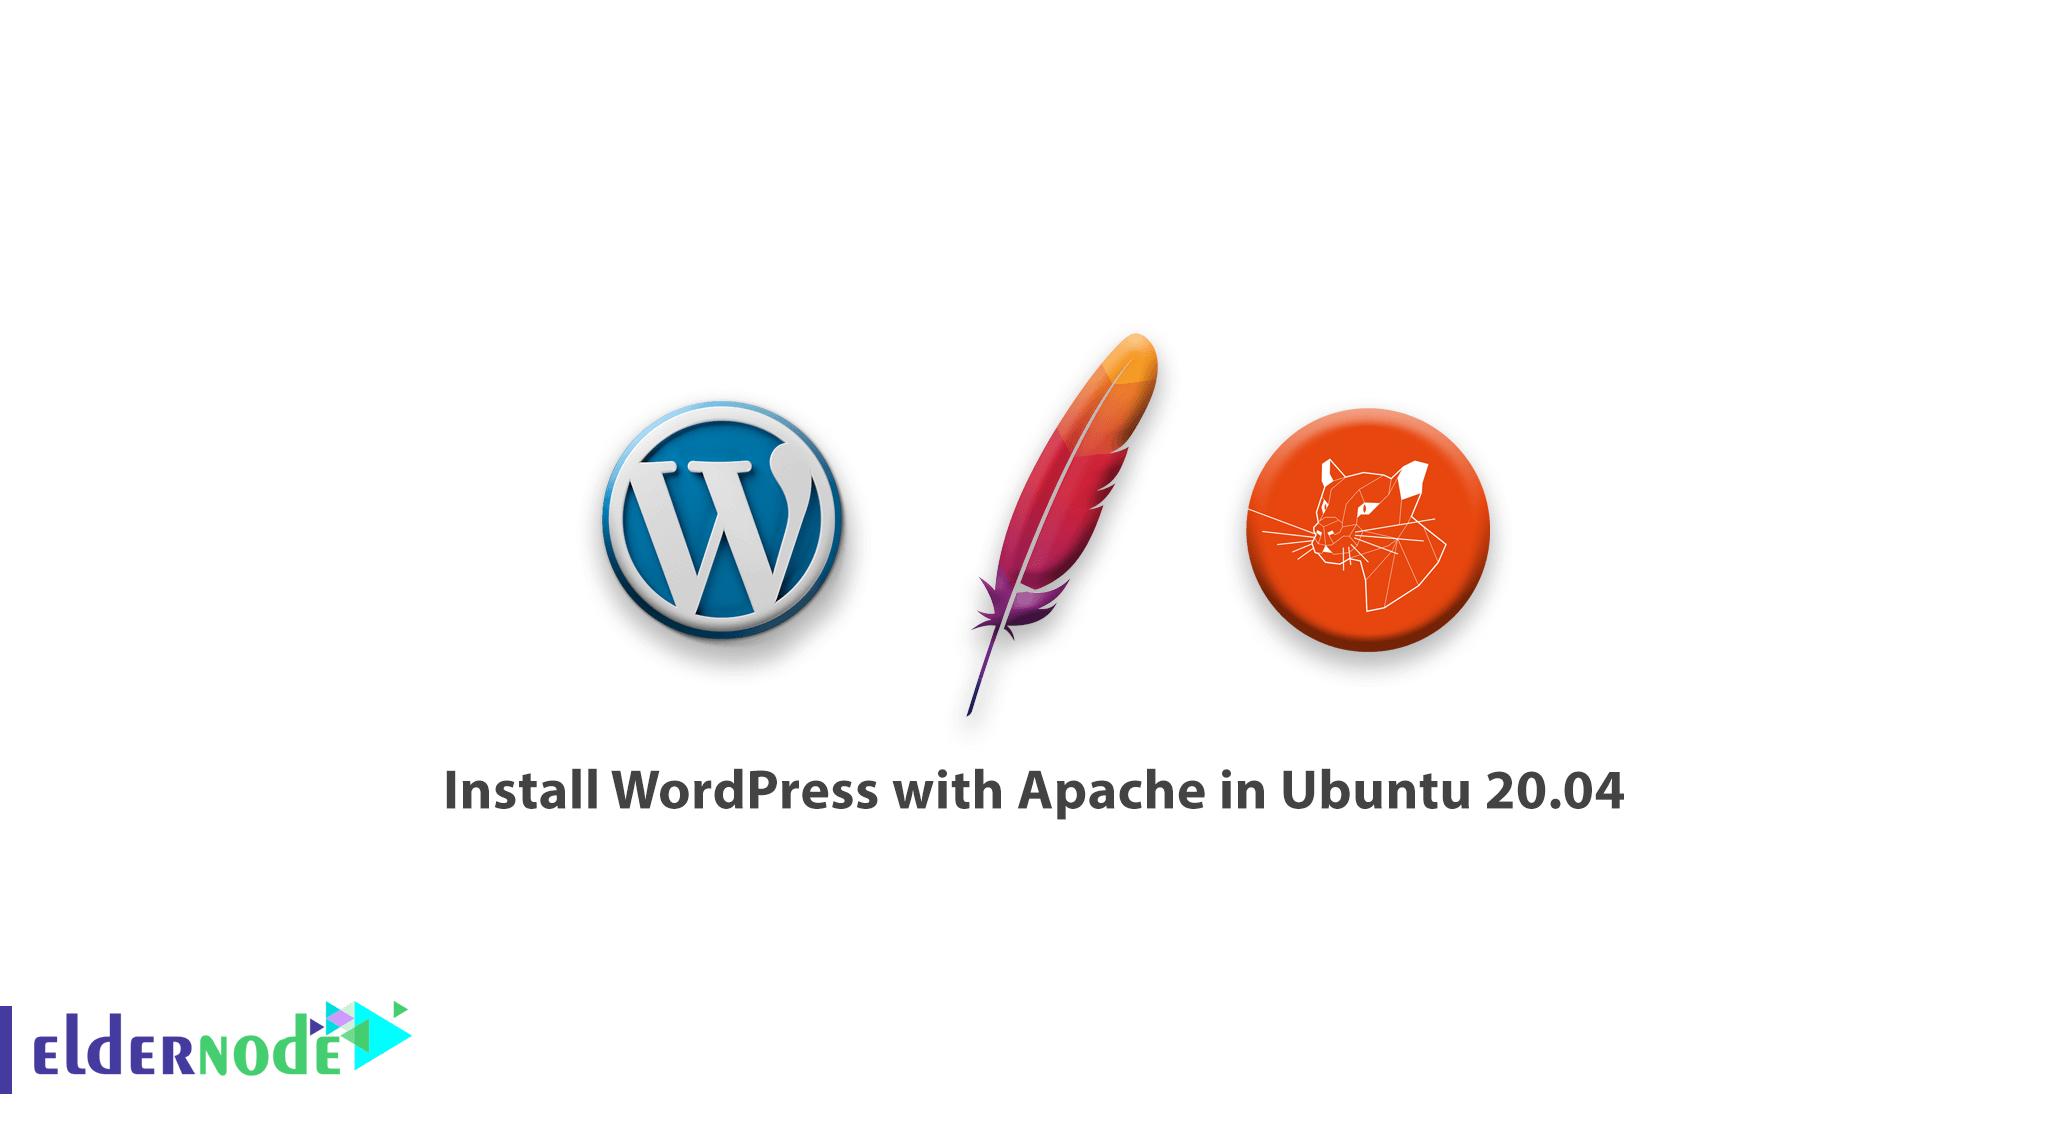 How to install WordPress with Apache in Ubuntu 20.04